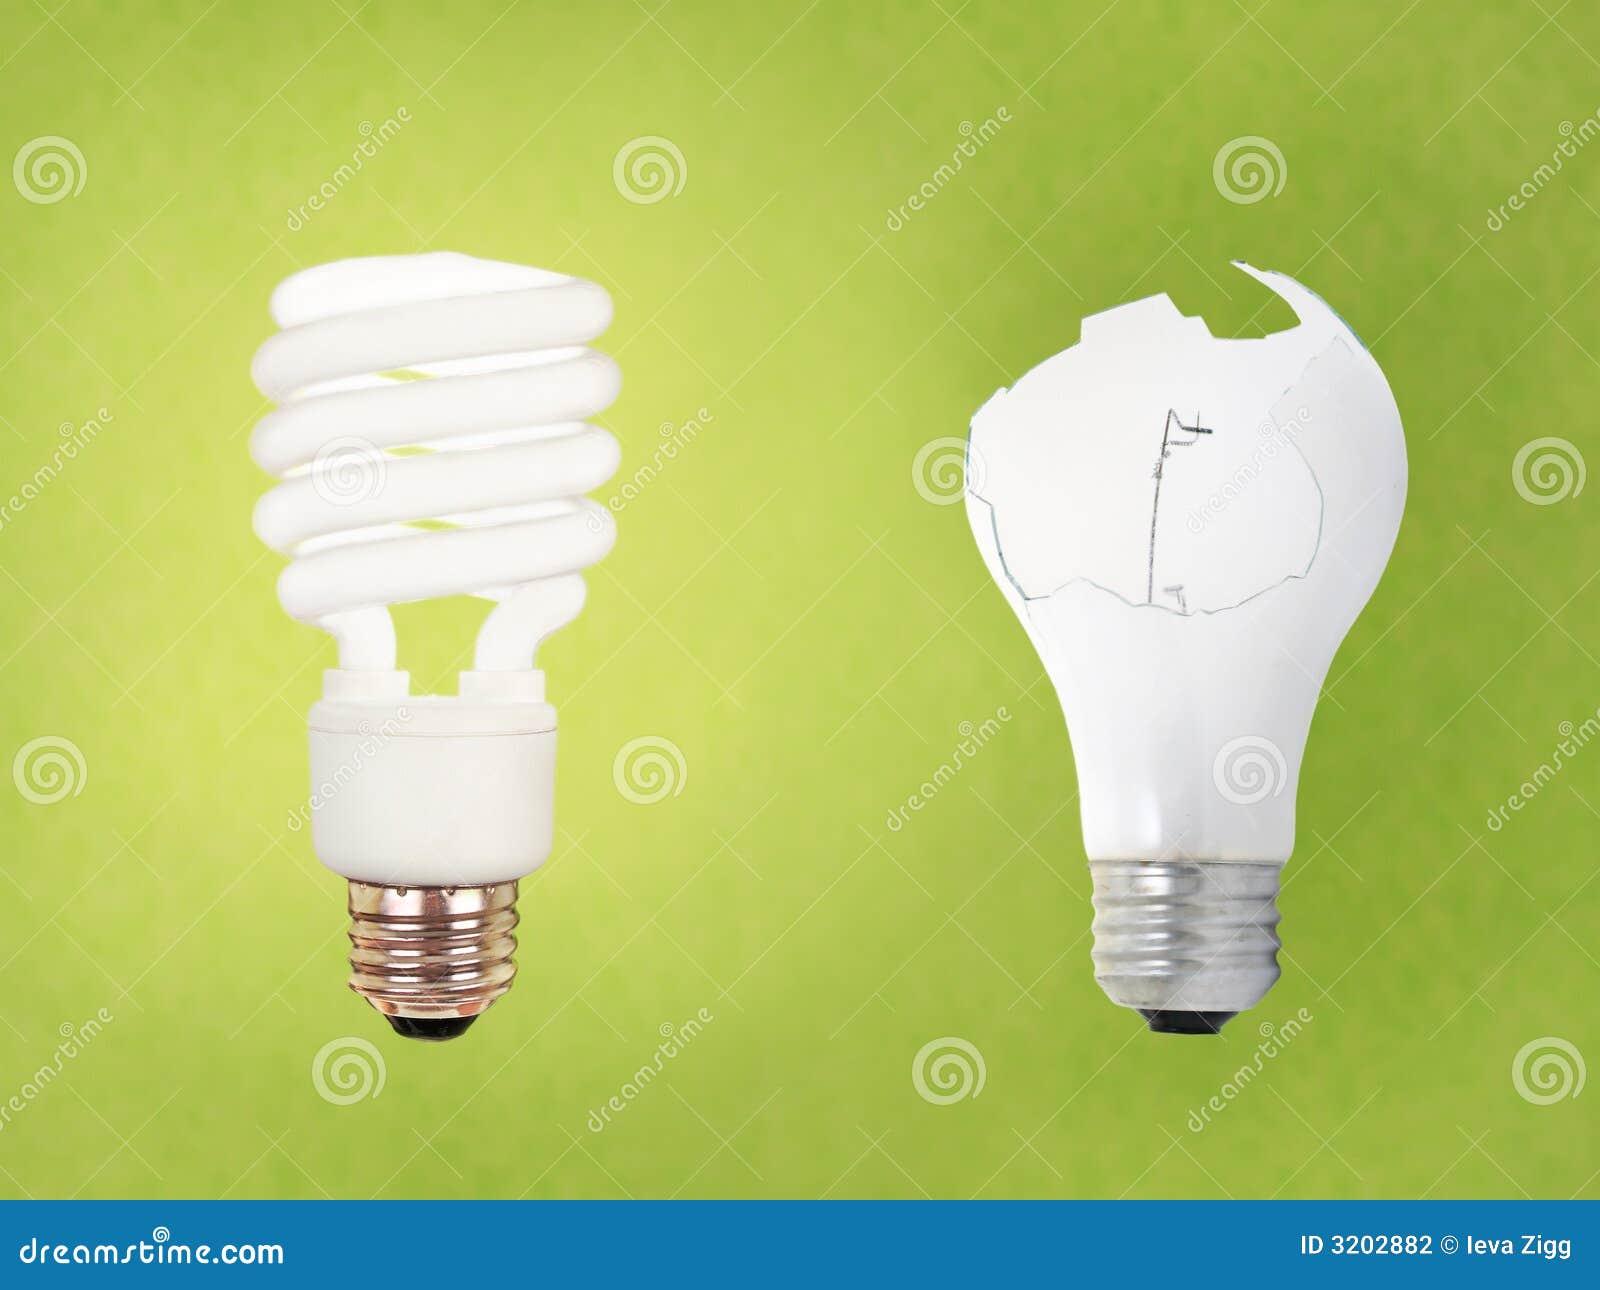 Ccfl Vs Broken Regular Bulb Stock Photo Image Of Save Modern 3202882